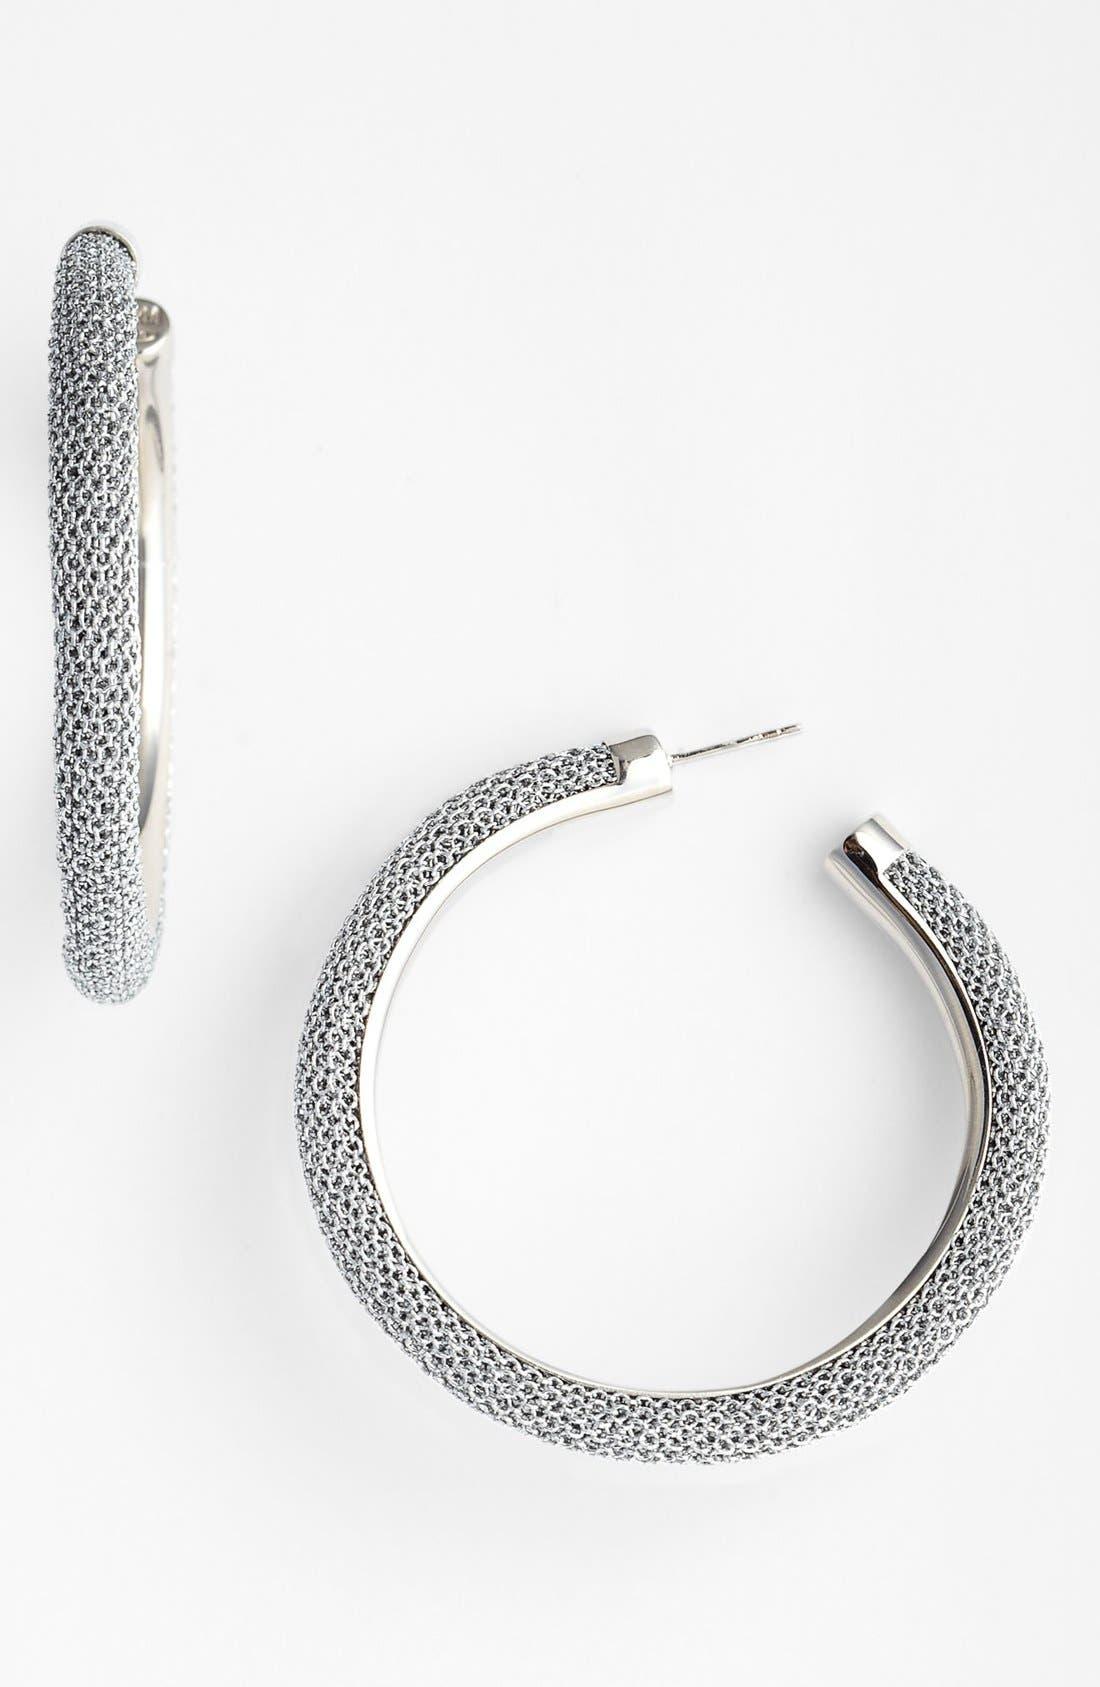 Alternate Image 1 Selected - Adami & Martucci 'Mesh' Large Hoop Earrings